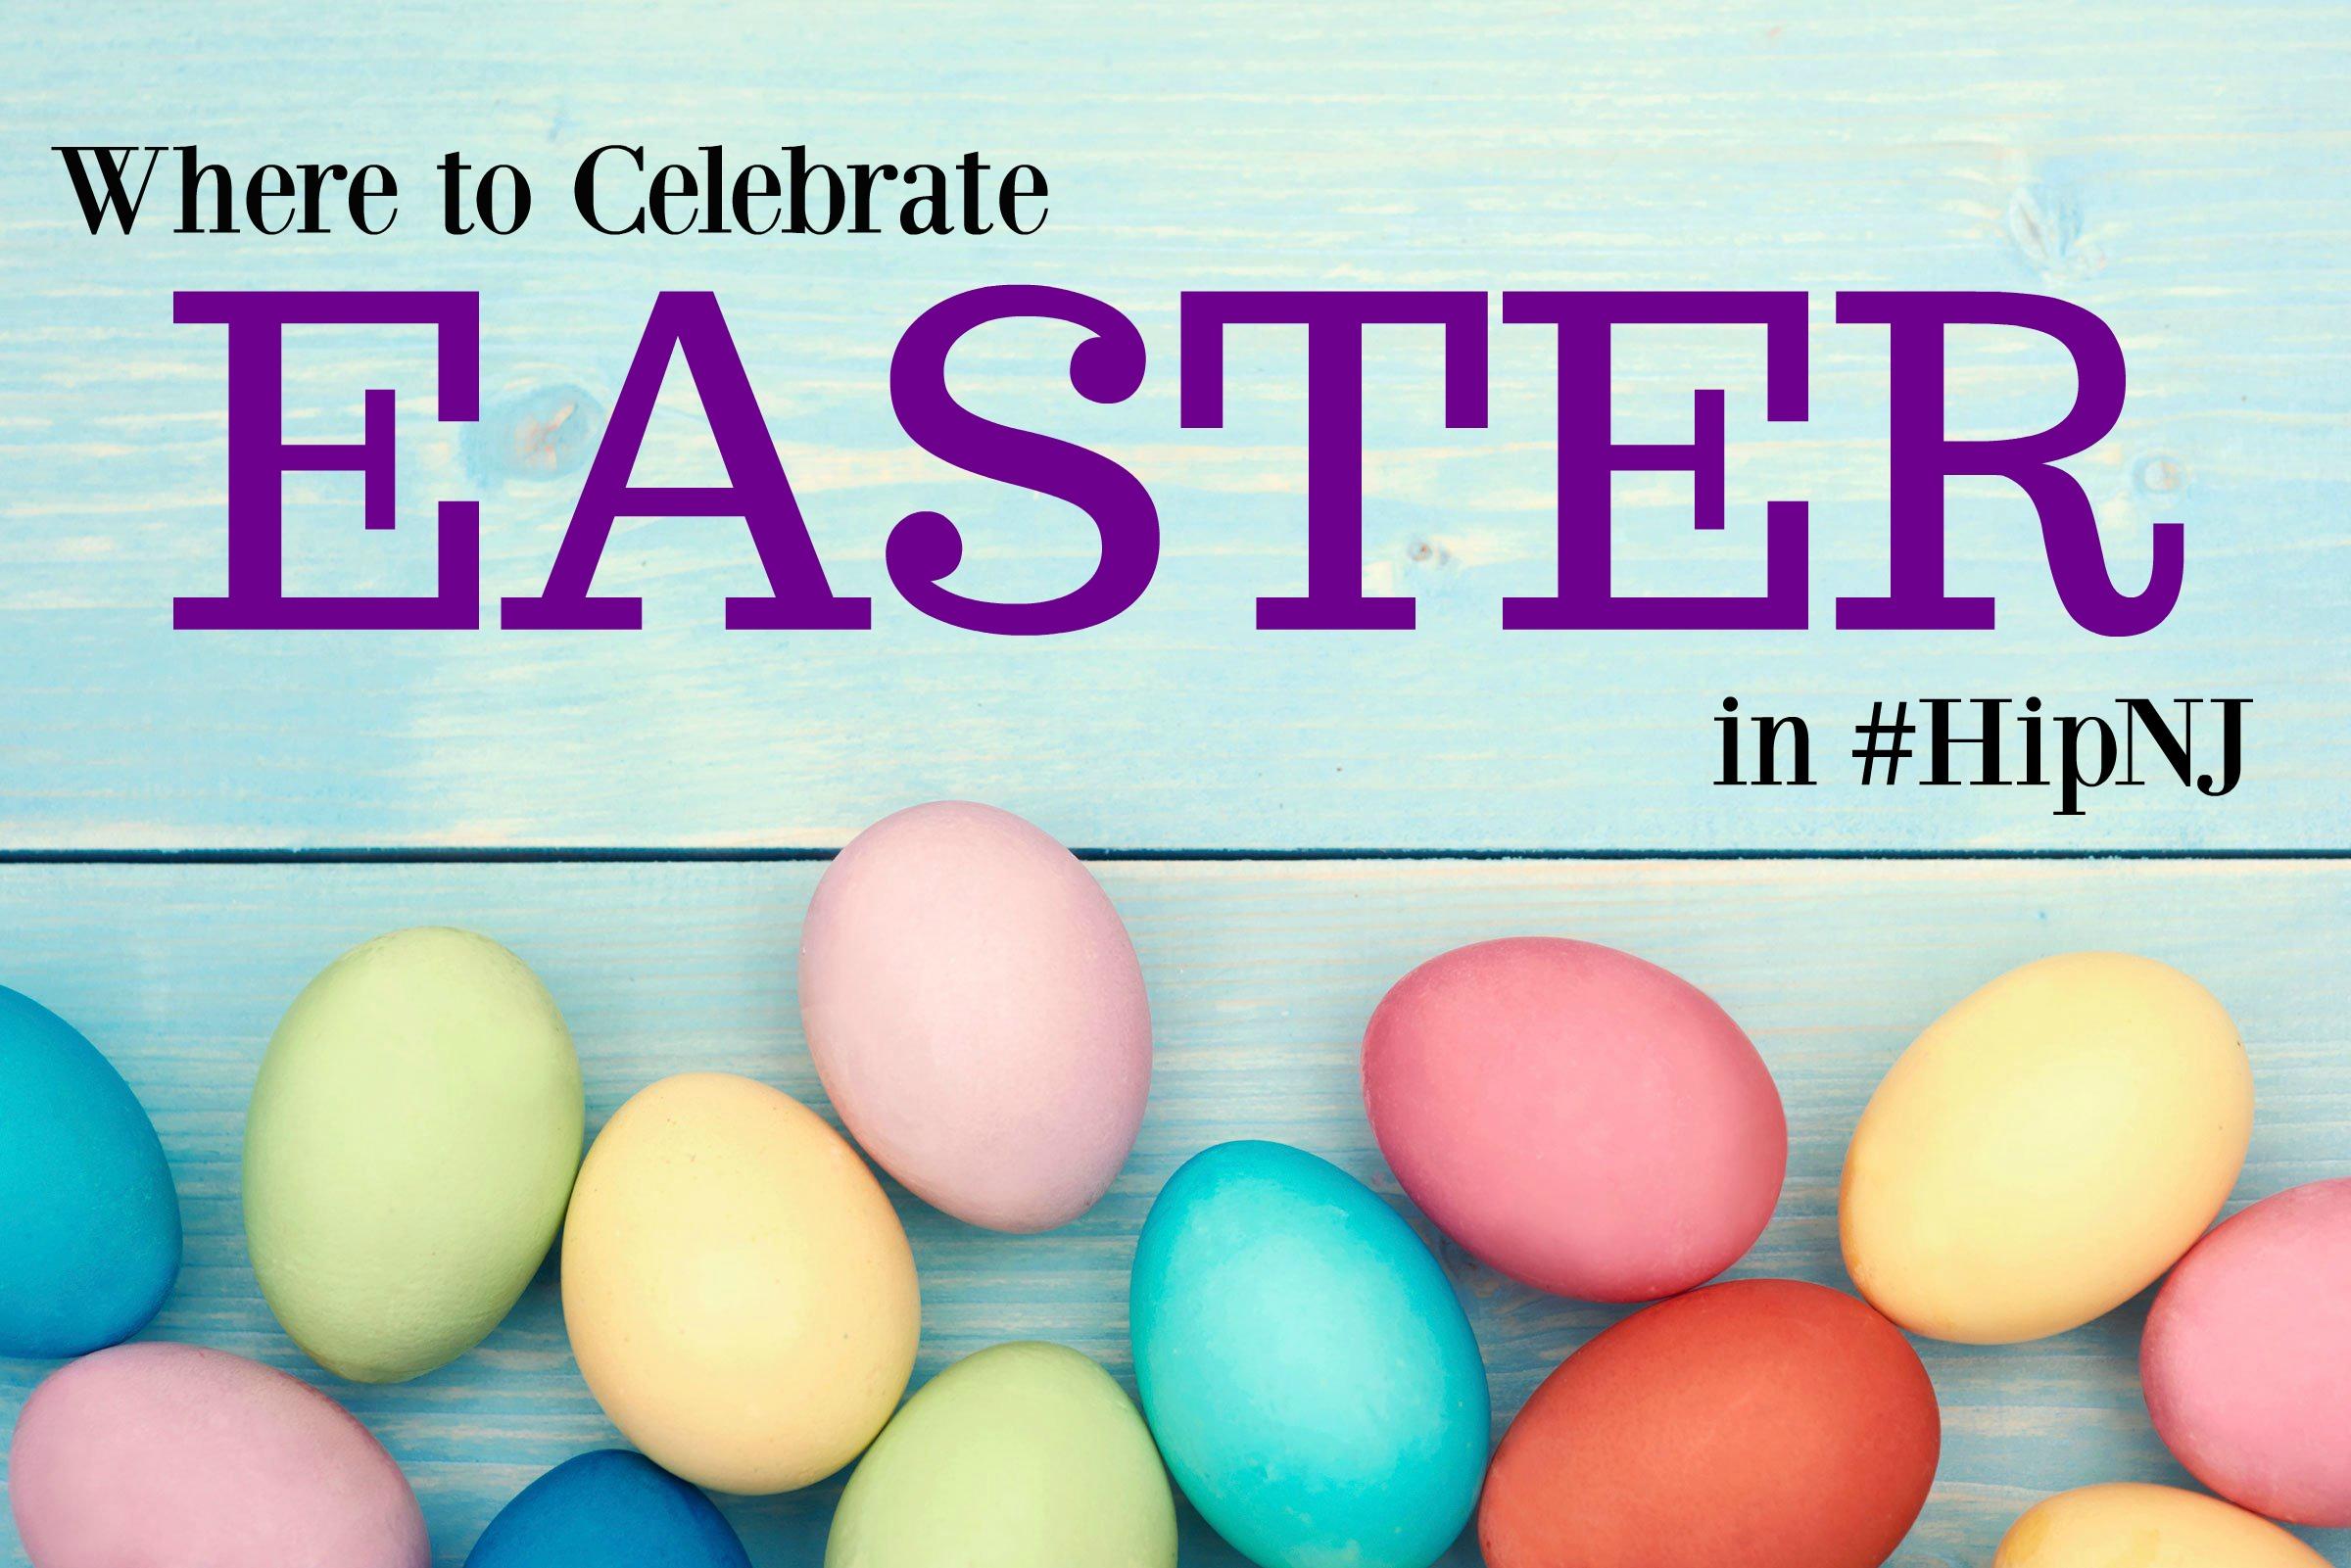 Where to Celebrate Easter in #HipNJ